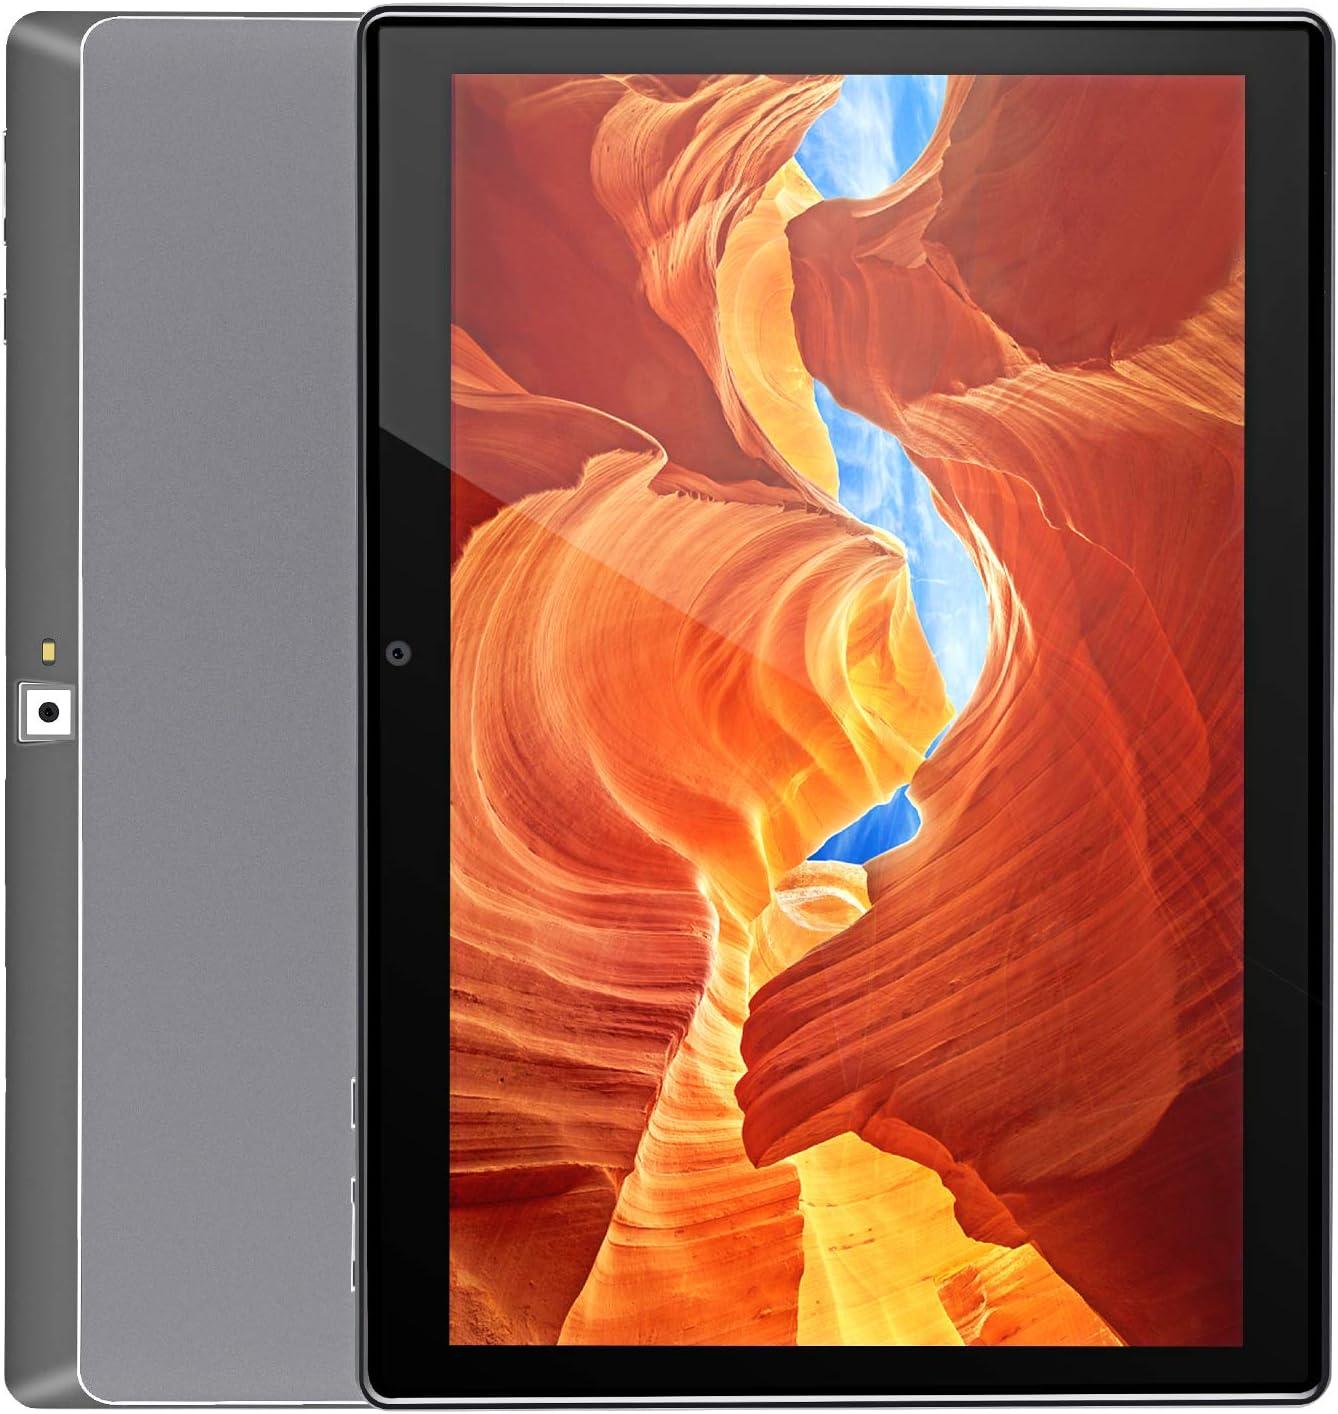 Tablet 10.1 inch,Android 9.0 Pie,2GB RAM,32GB Storage,1280x800 G+G IPS HD Display,2MP+8MP Camera,Bluetooth,Wi-Fi,GPS,Type-C Port,Metal Body(3G-Gray)